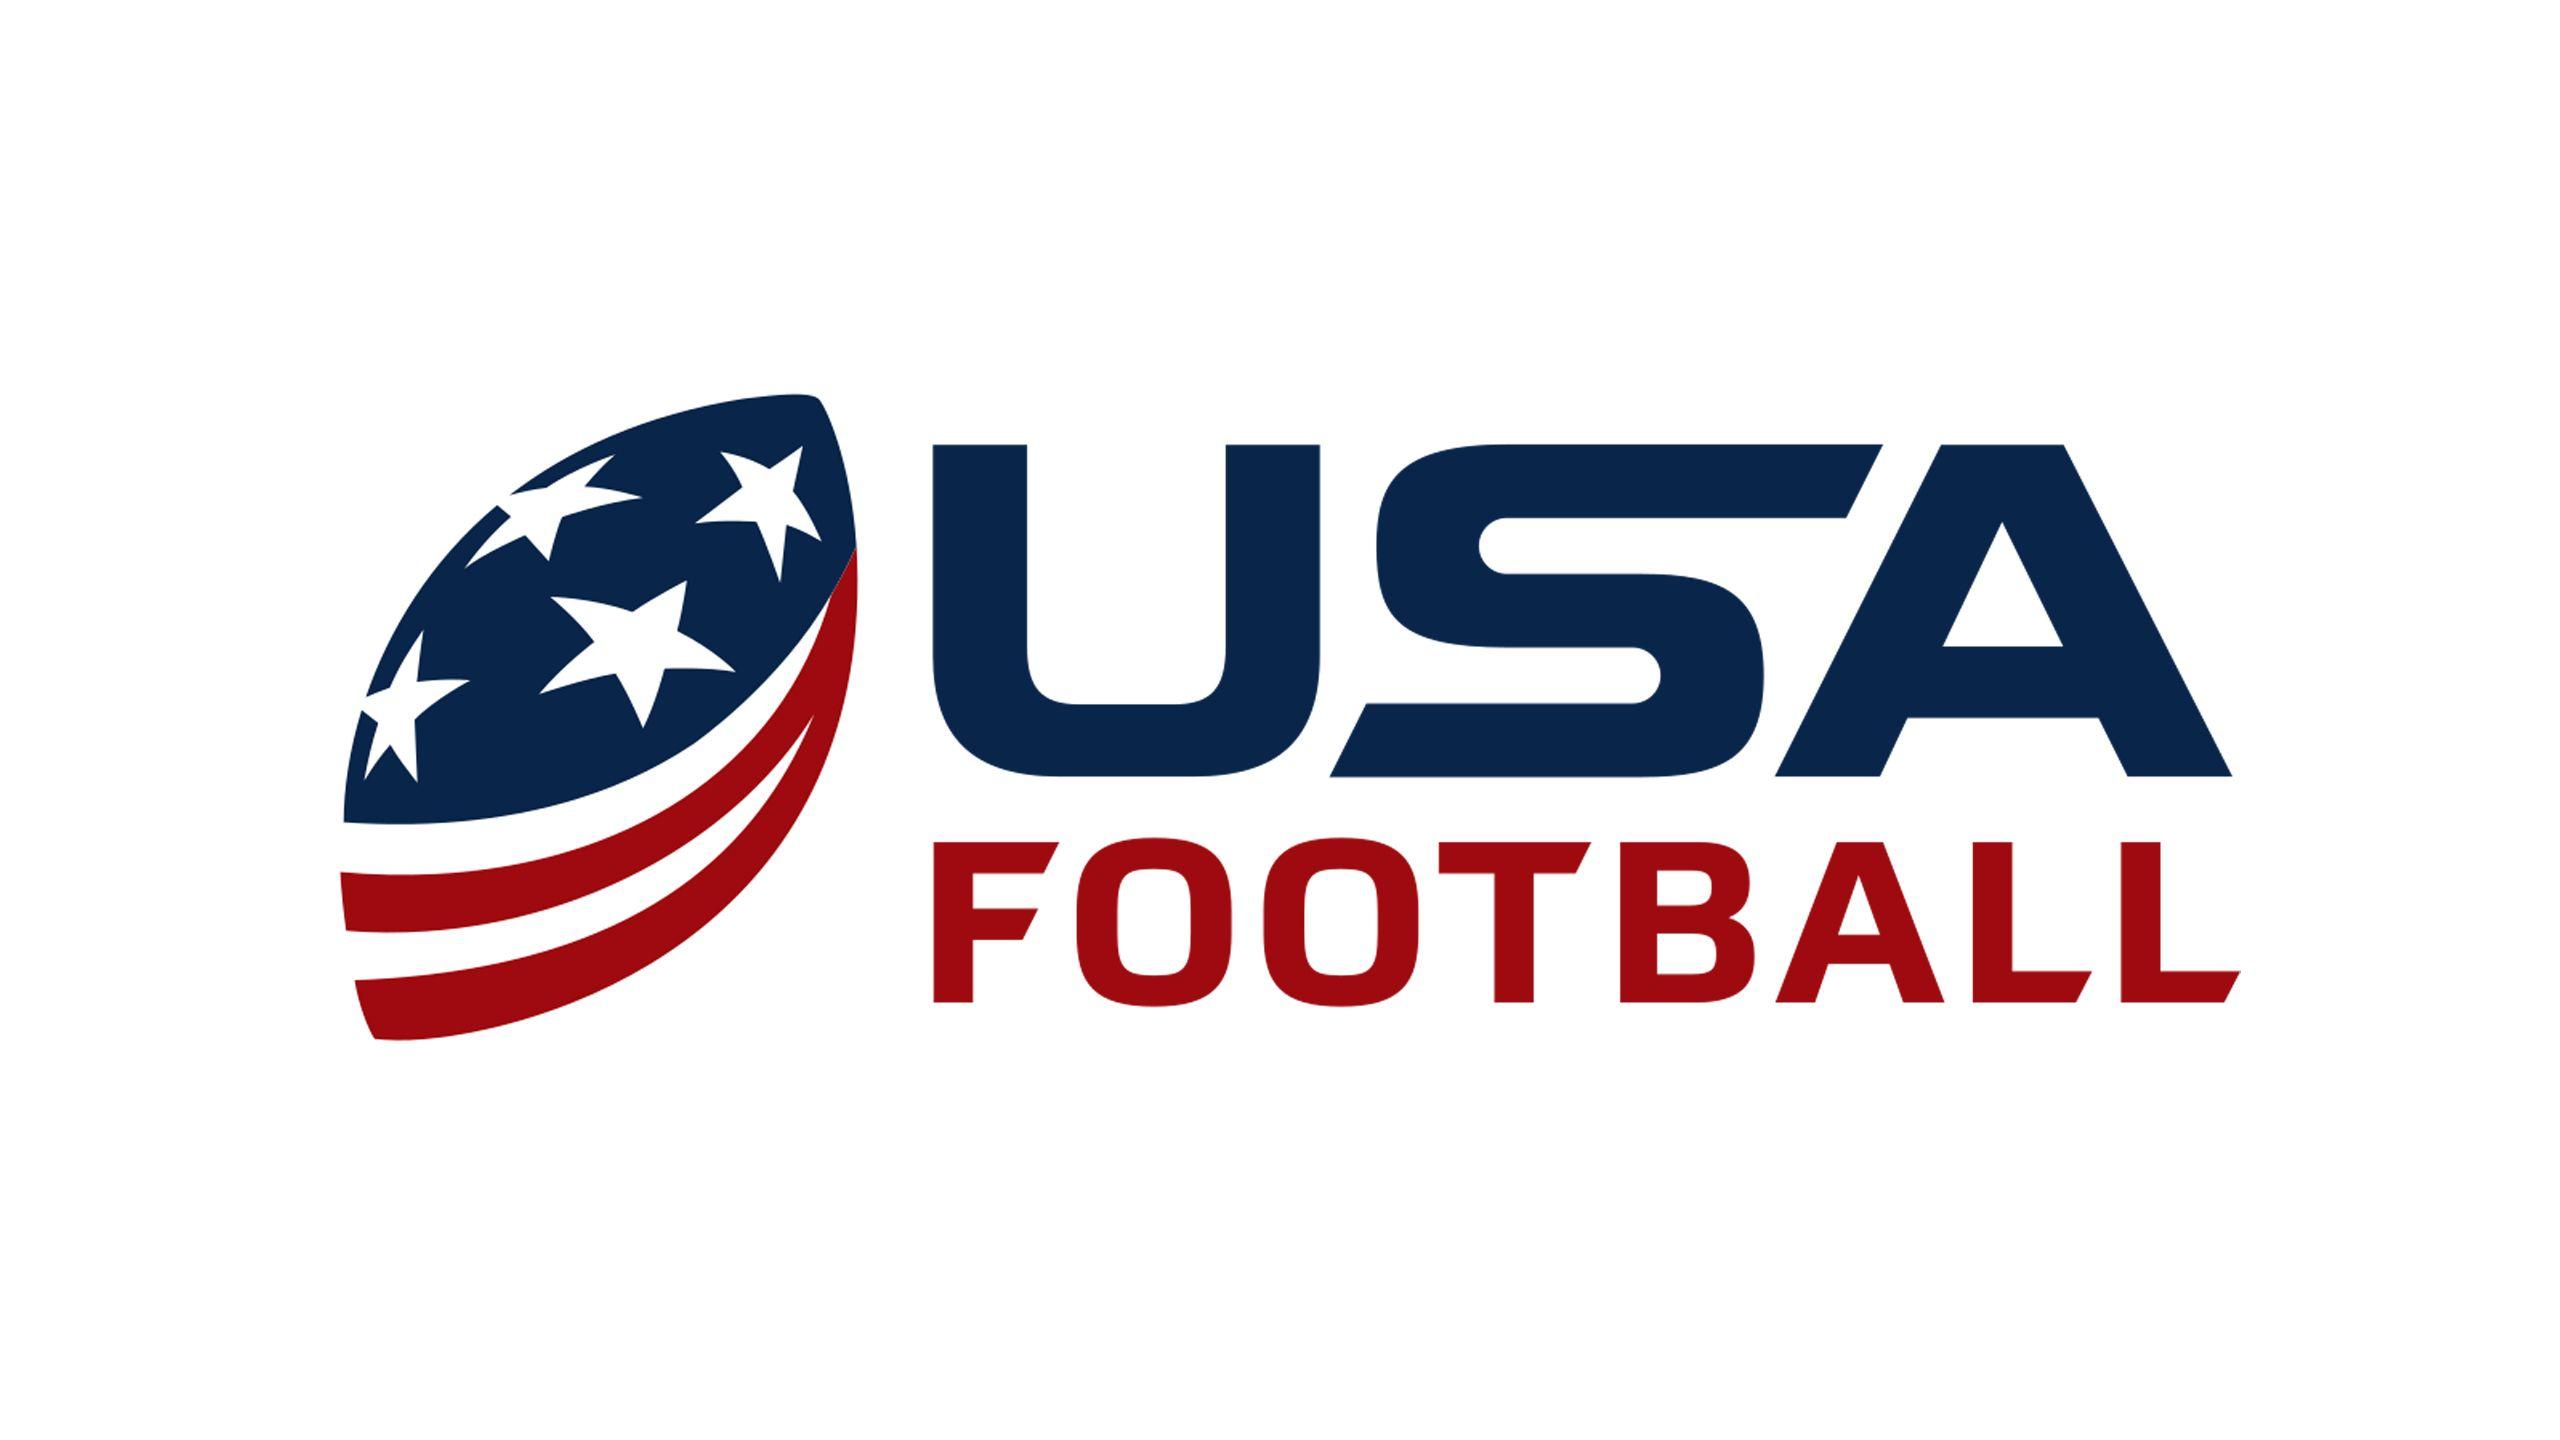 USA Football Equipment & Field Grants